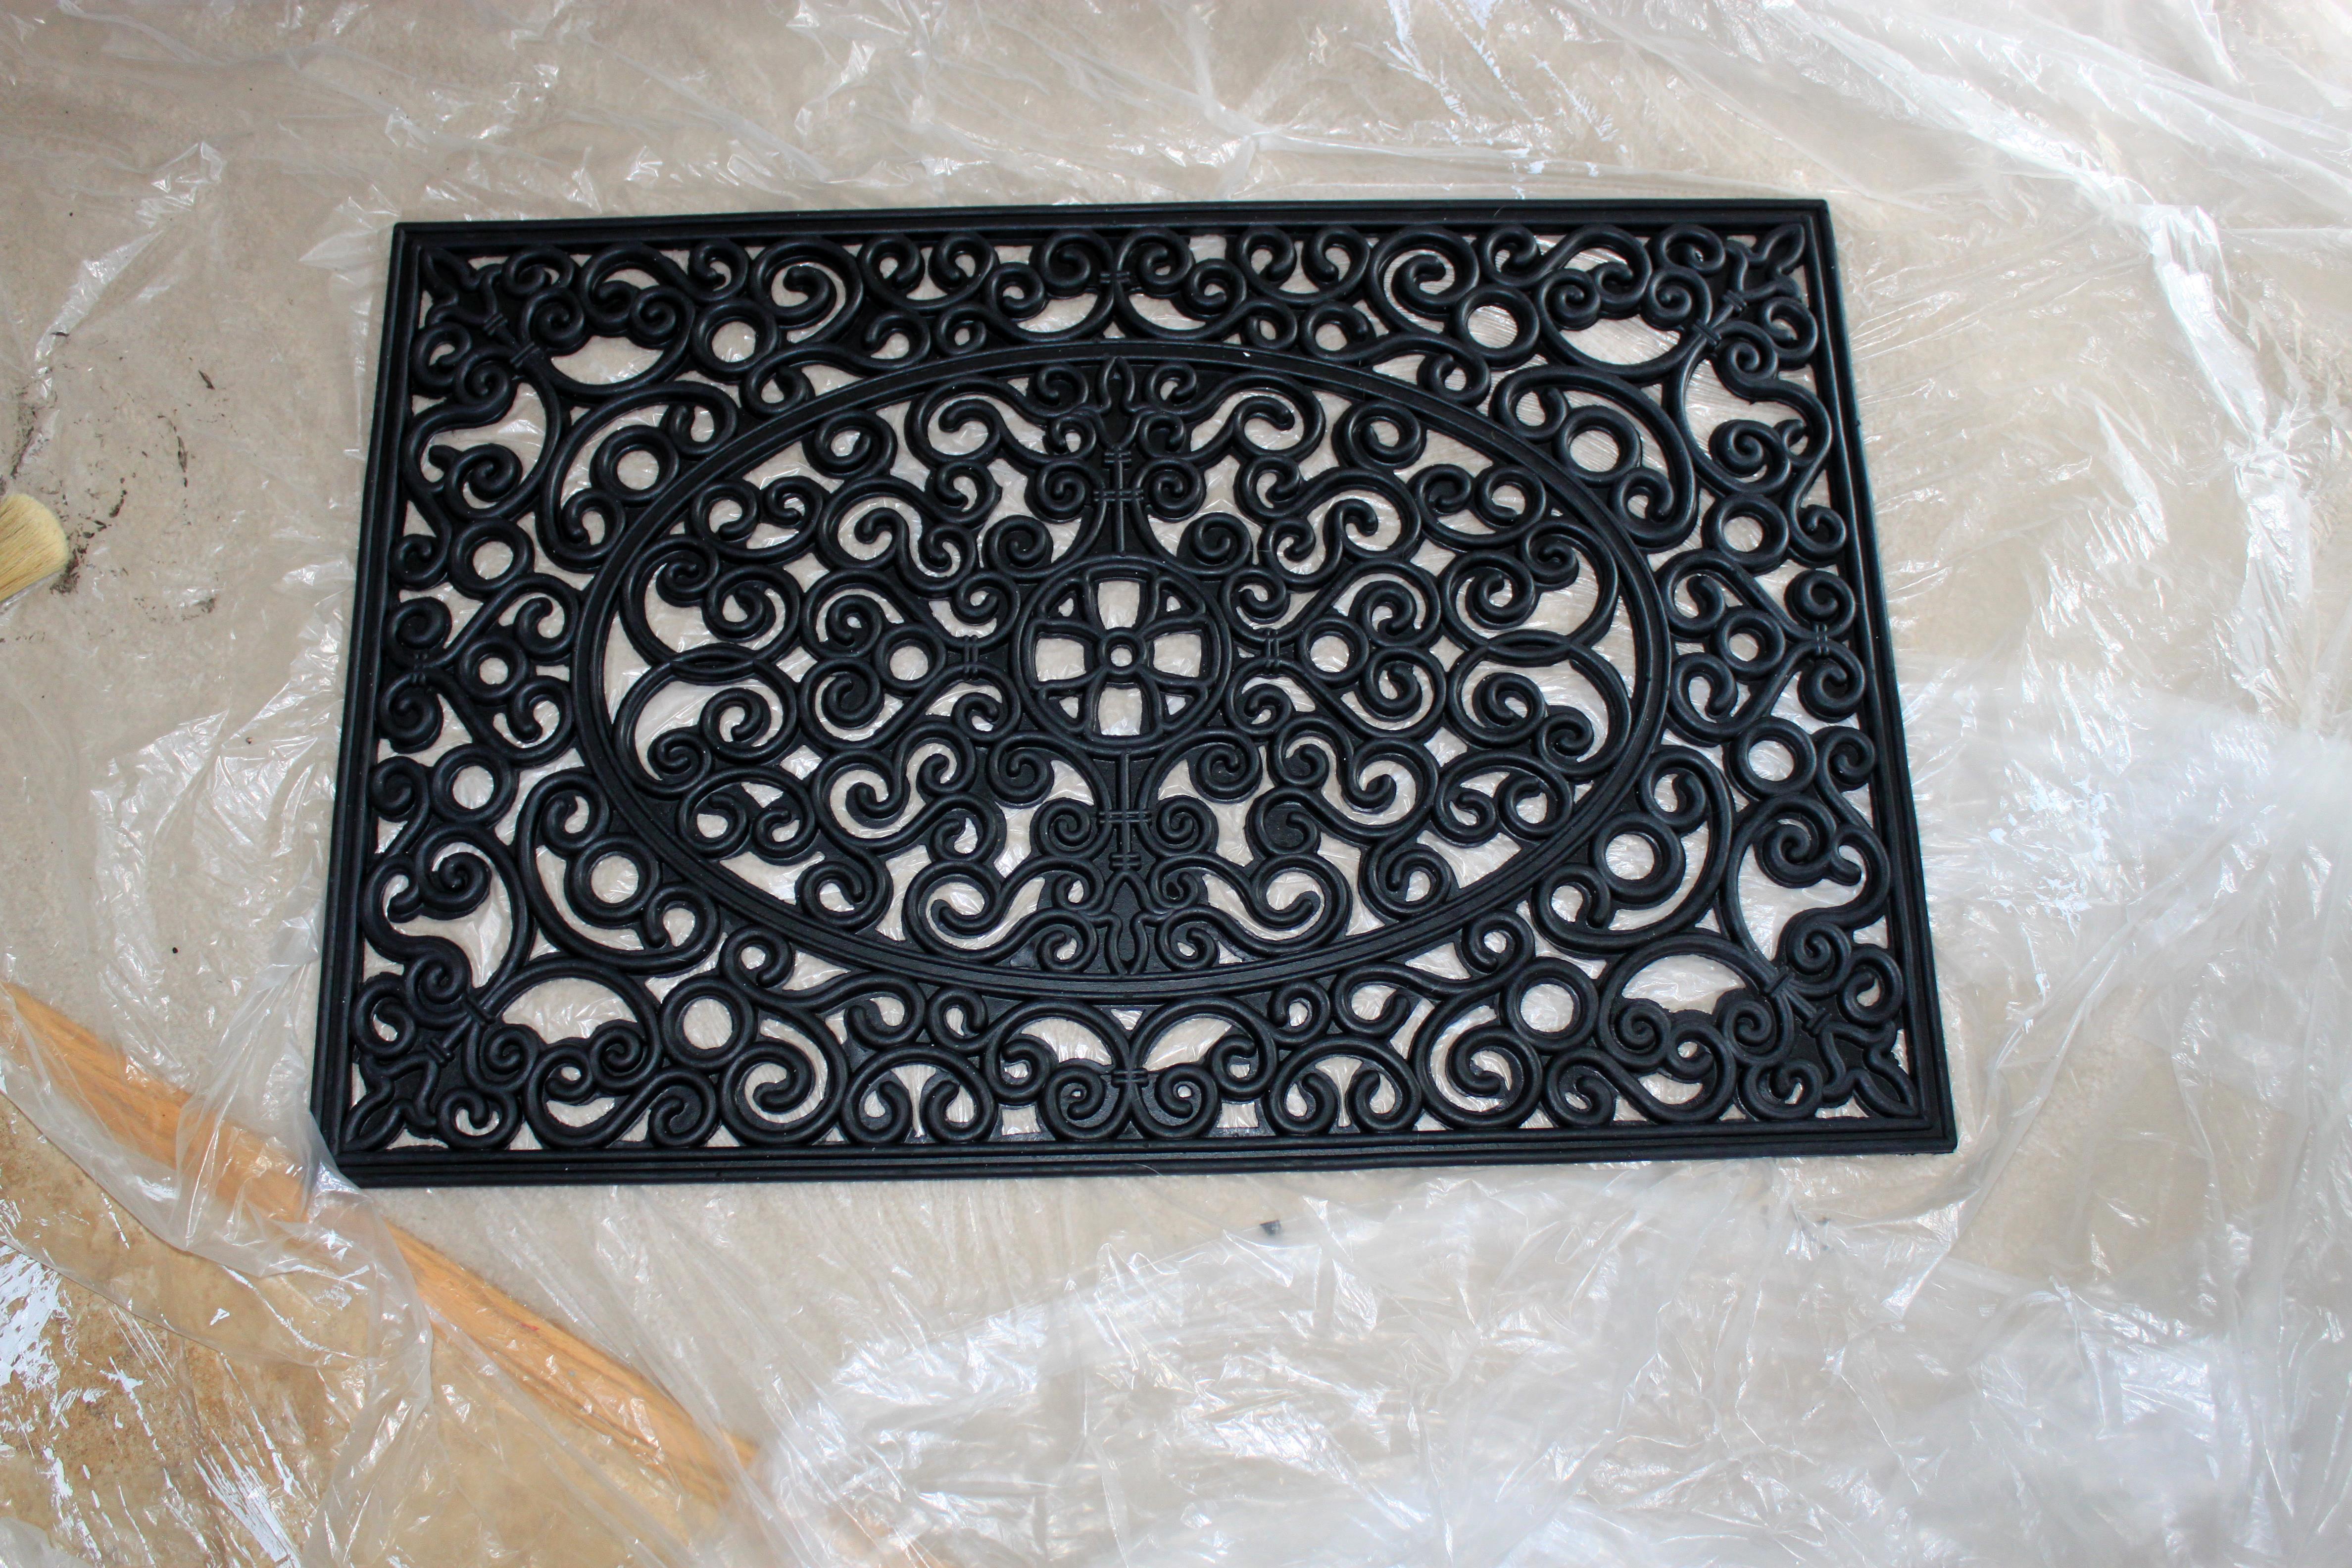 Black Rod Iron Wall Decor Faux Wrought Iron Wall Decor  Just Like Playing House